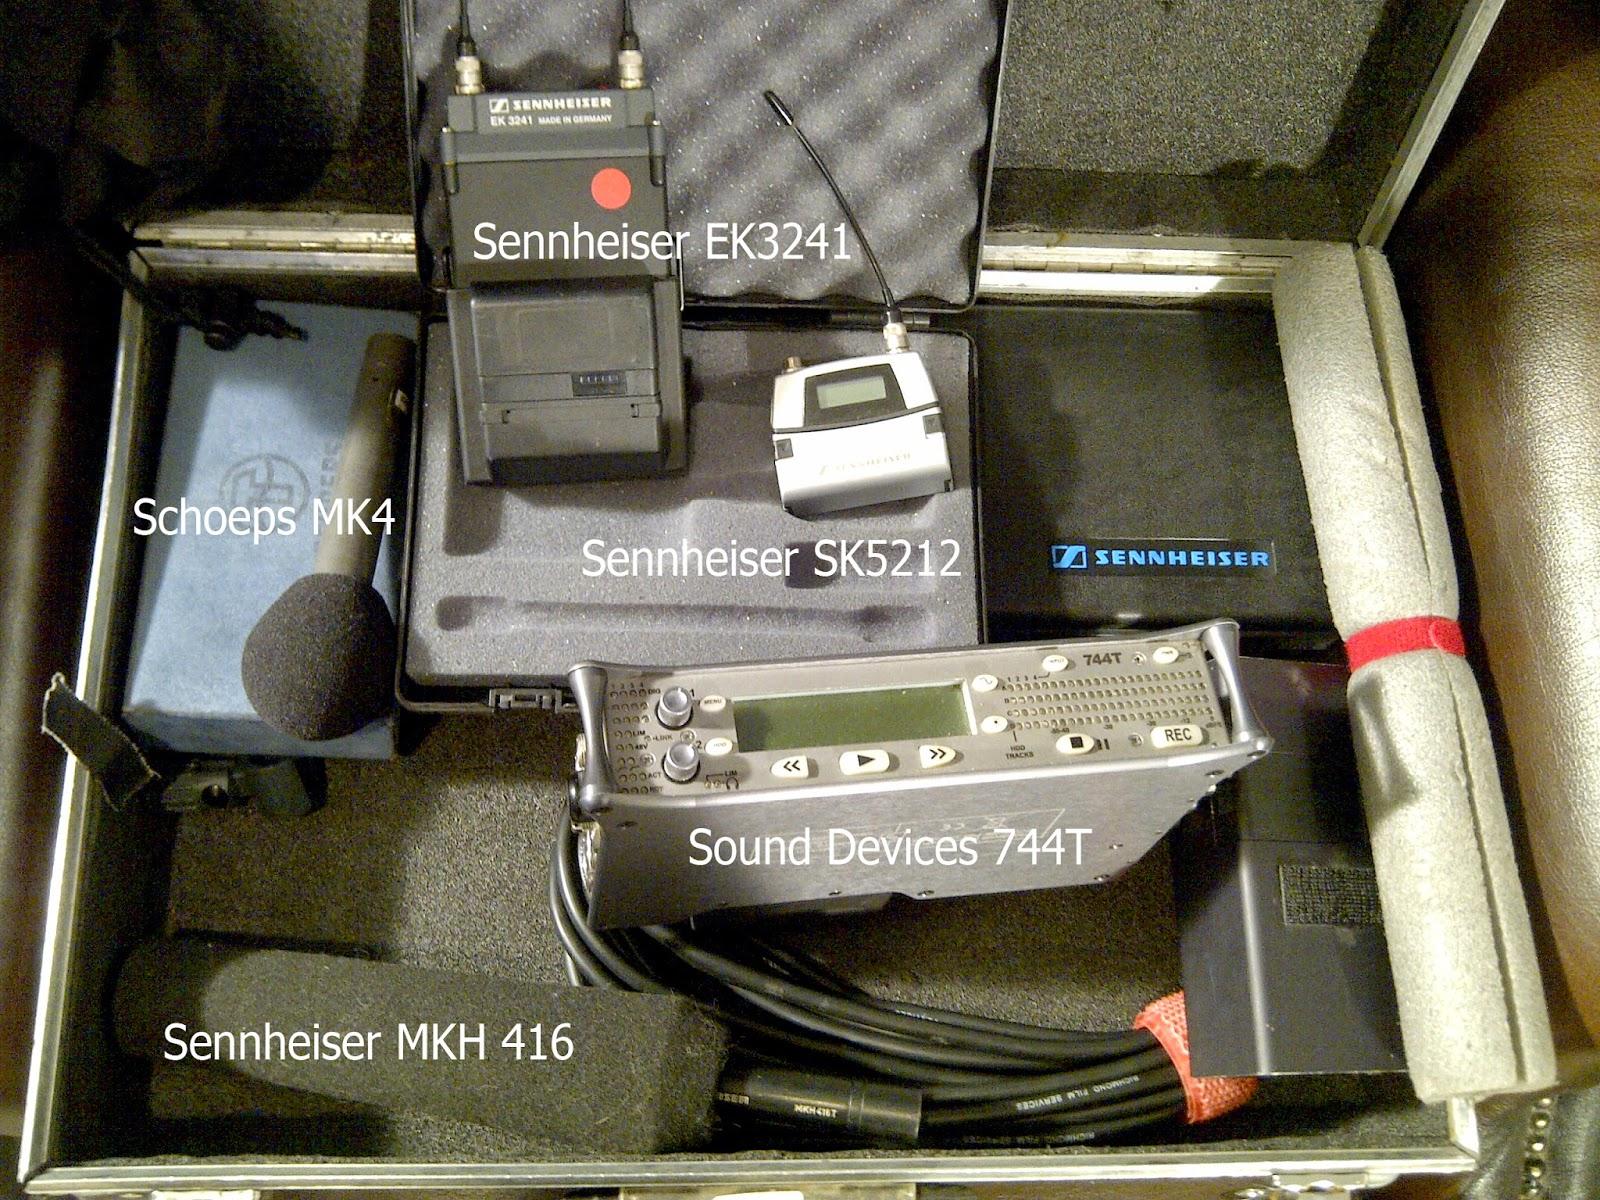 Sound recorder 744T